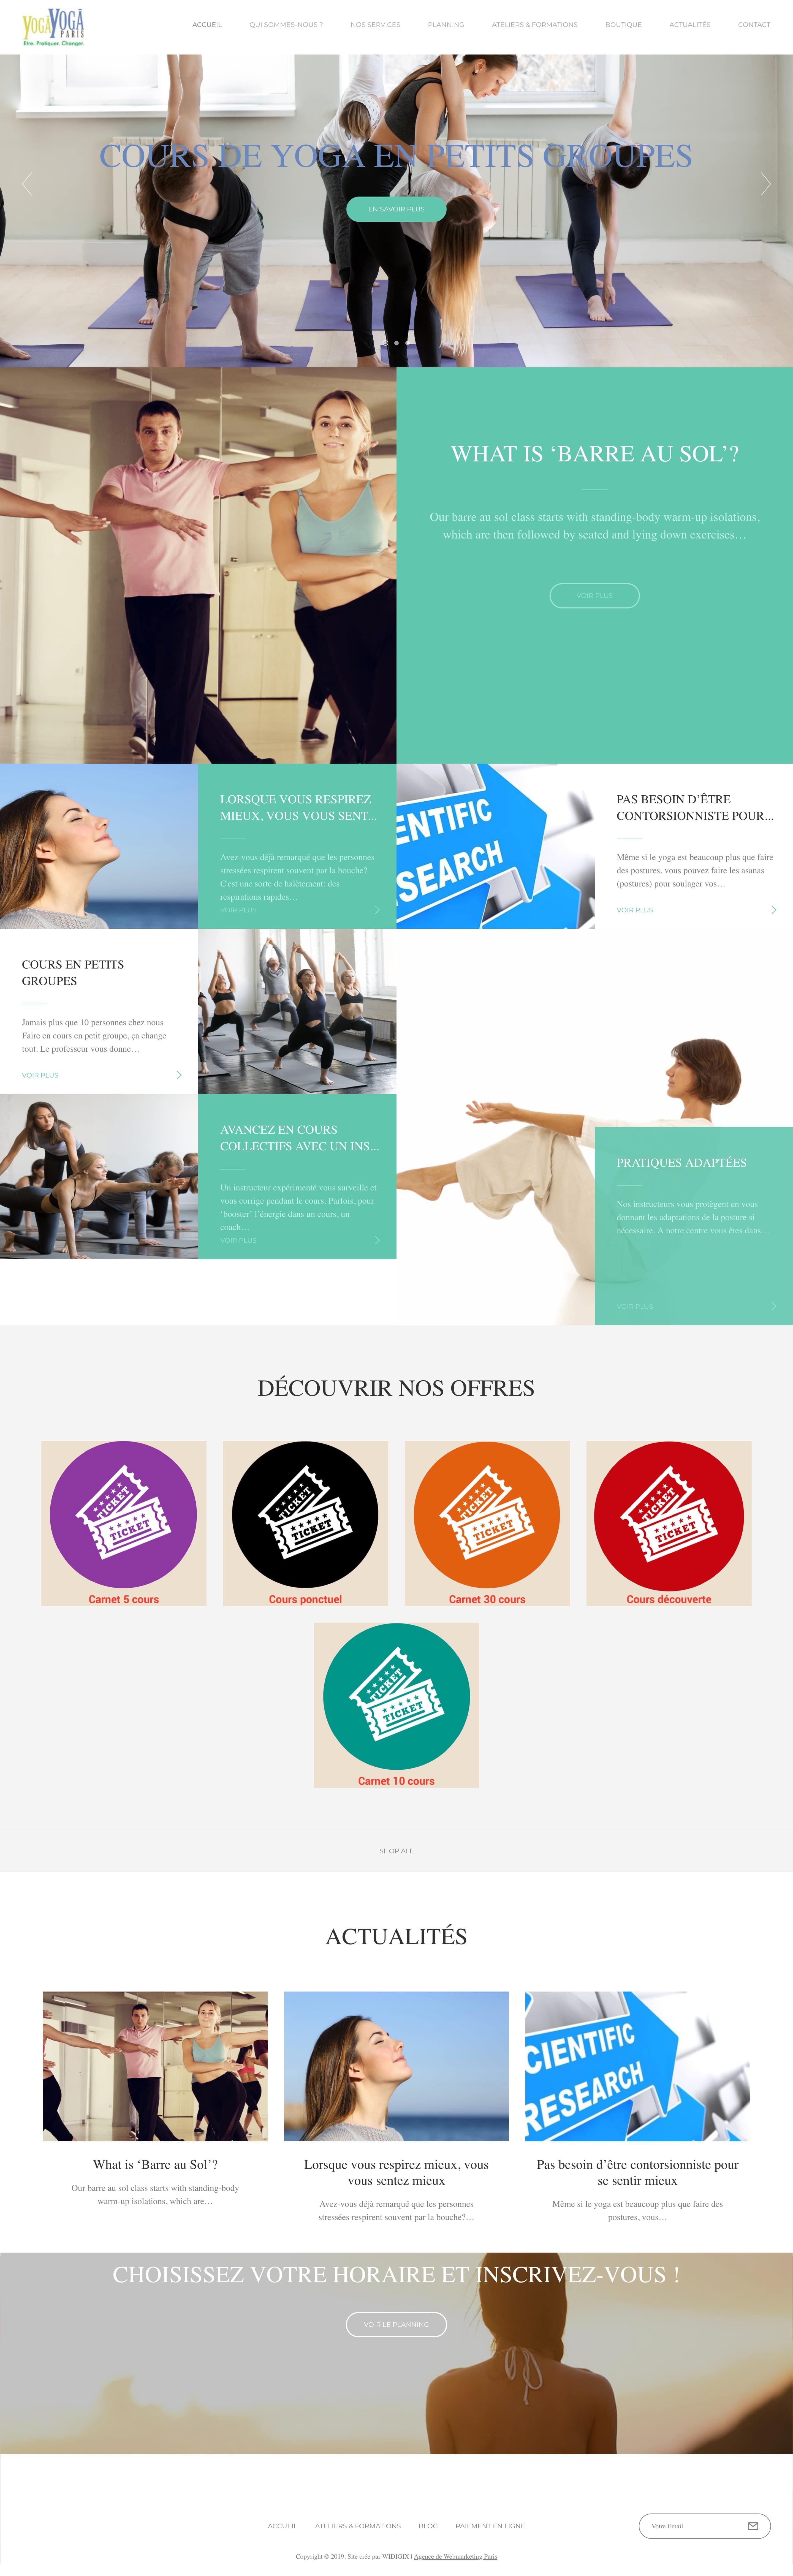 Yoga-yoga-Paris-Site-Internet-Agence-Webmarketing-Paris-min